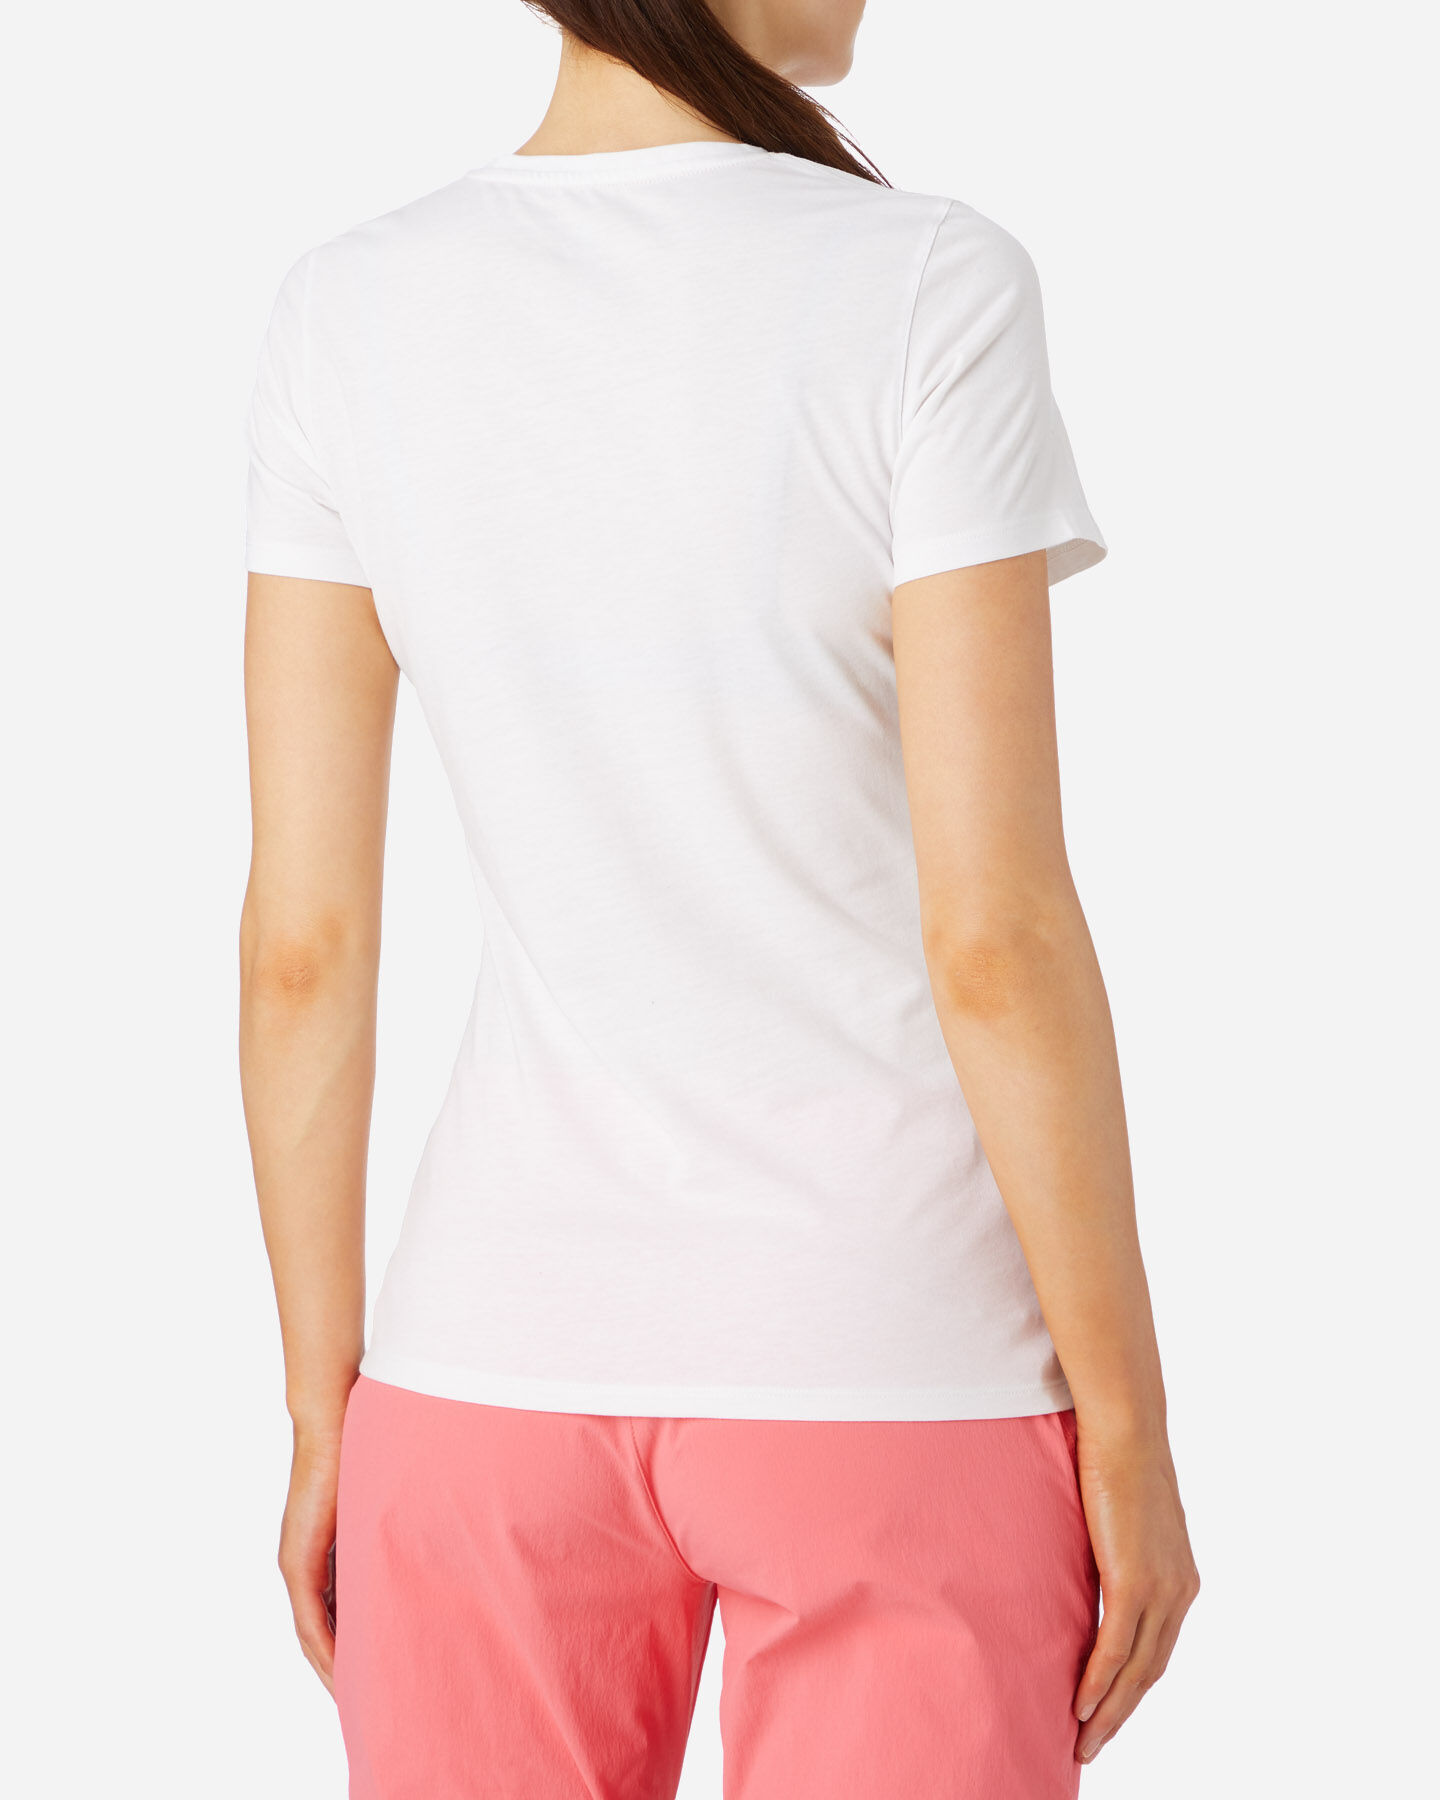 T-Shirt MCKINLEY KULMA W S5266688 scatto 2